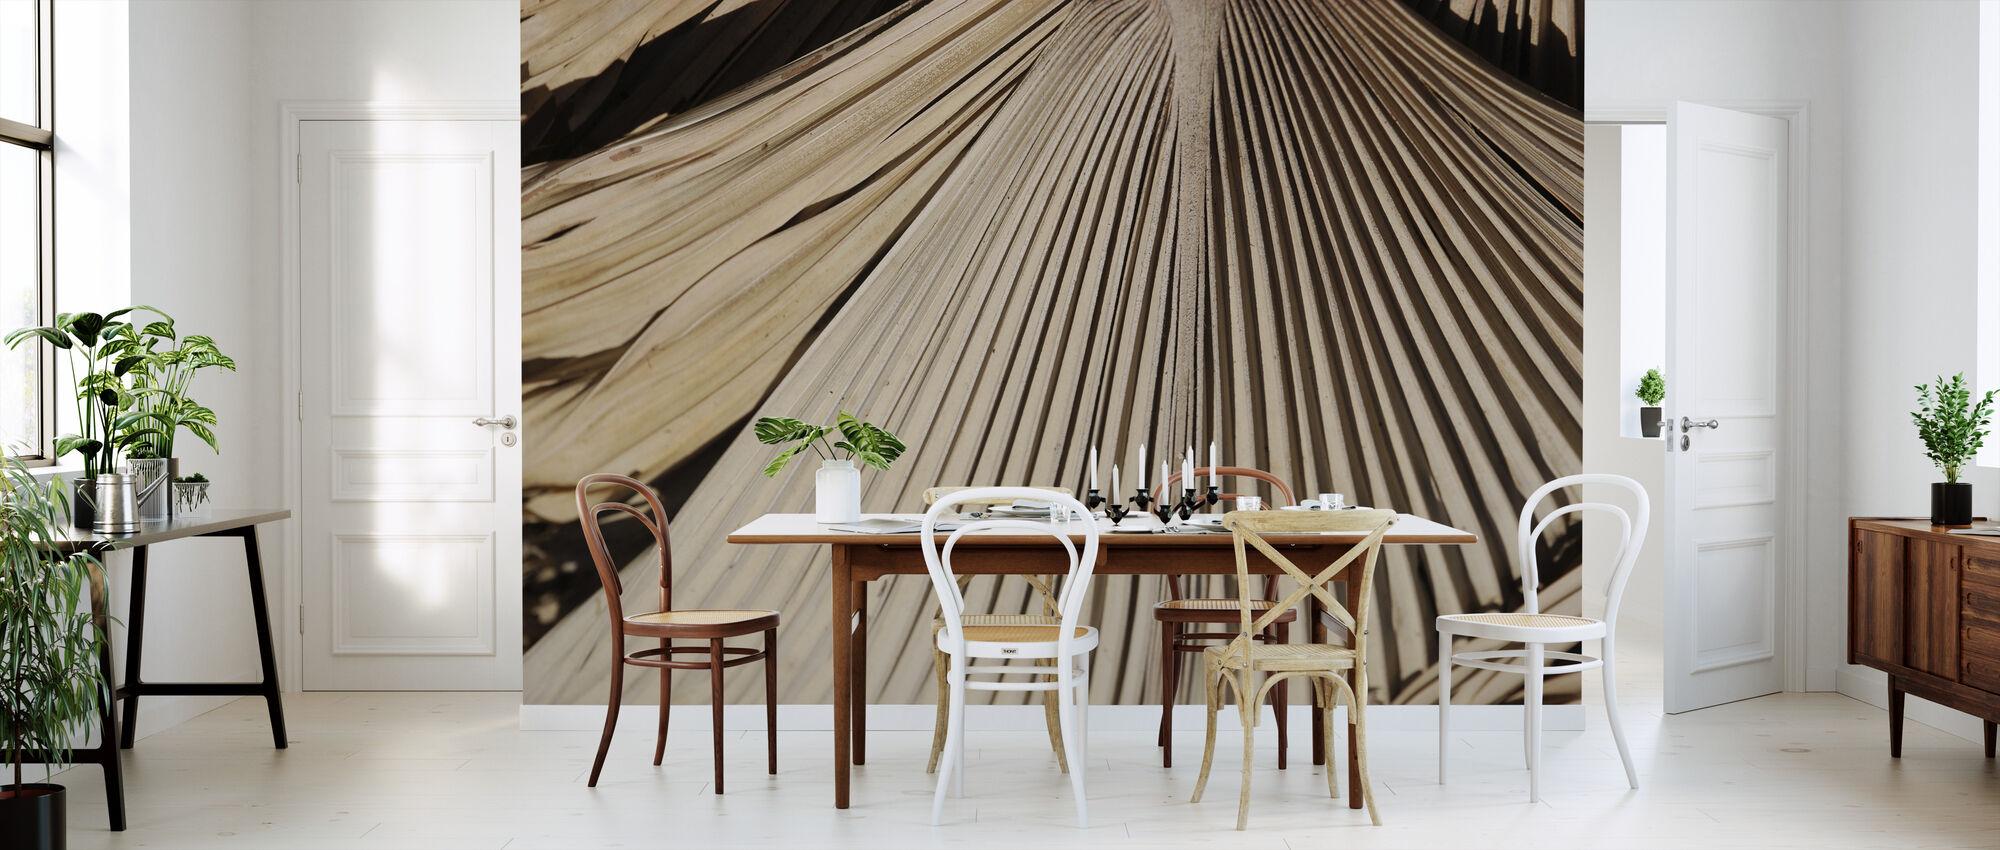 Gedroogde Palmen II - Behang - Keuken